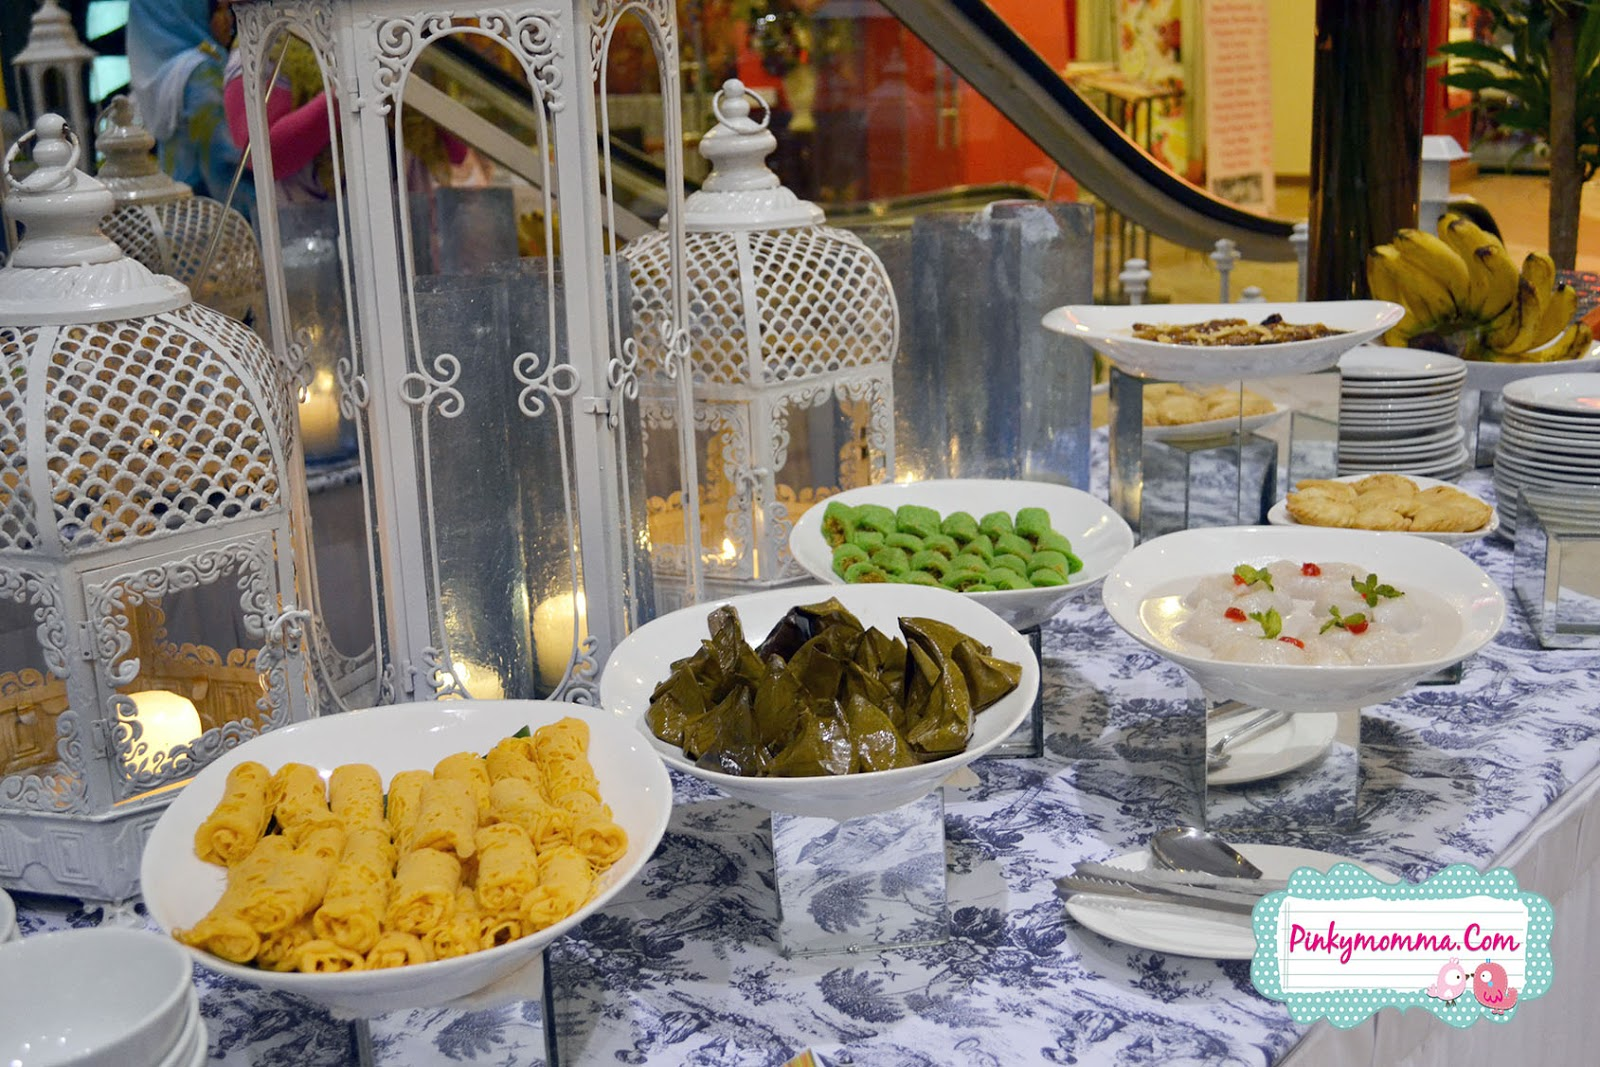 ... Buffet Ramadhan Di Flora Cafe Nama Saya Nadia | Share The Knownledge